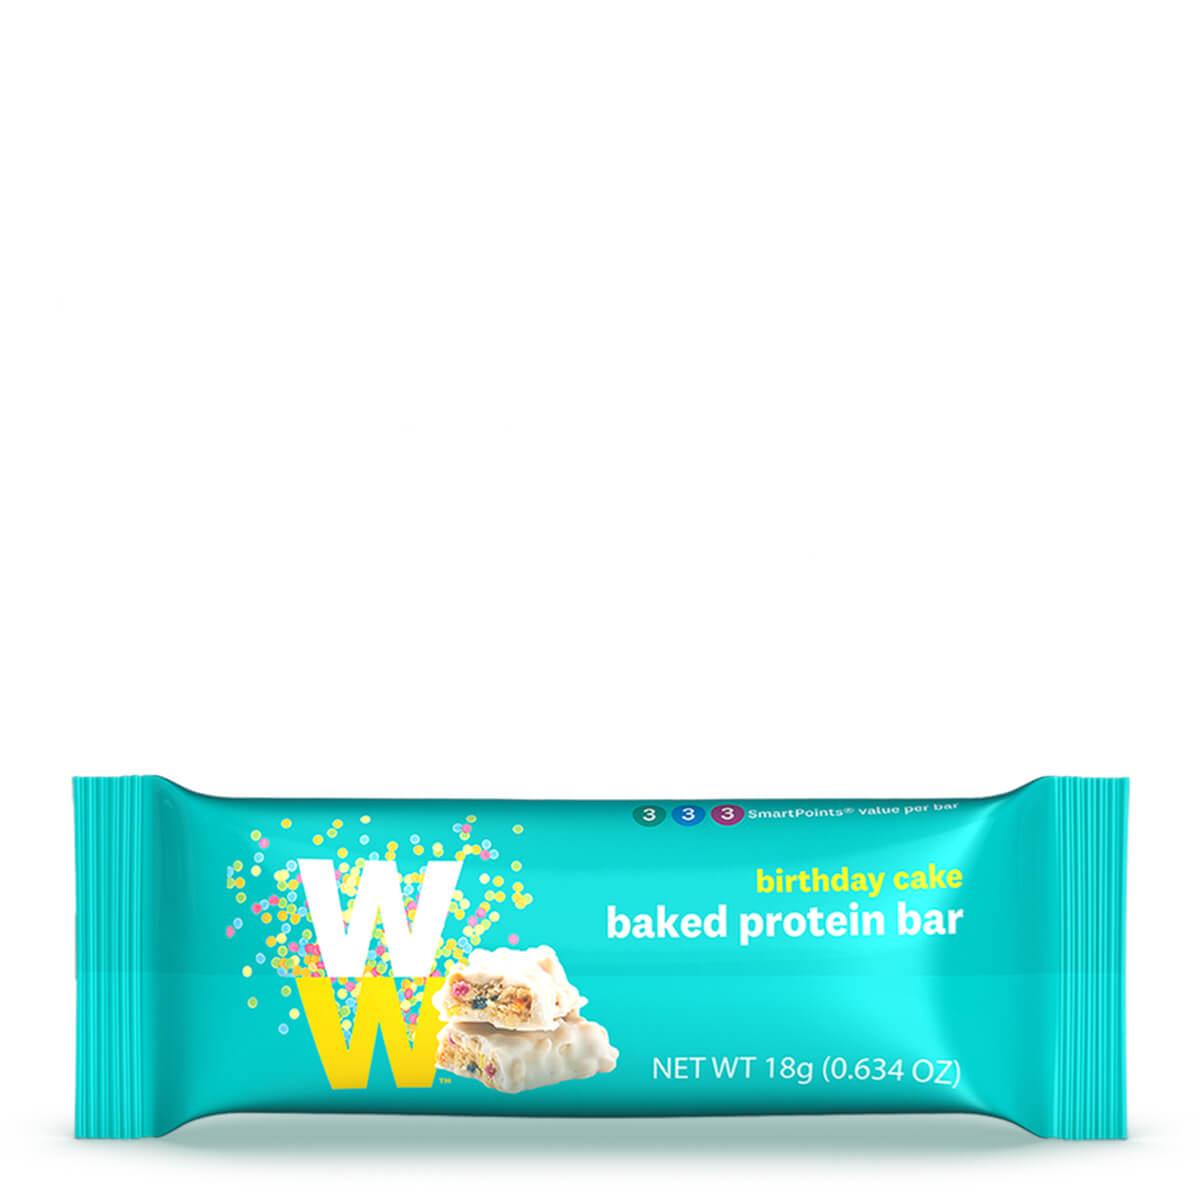 Birthday Cake Baked Protein Bar - bar